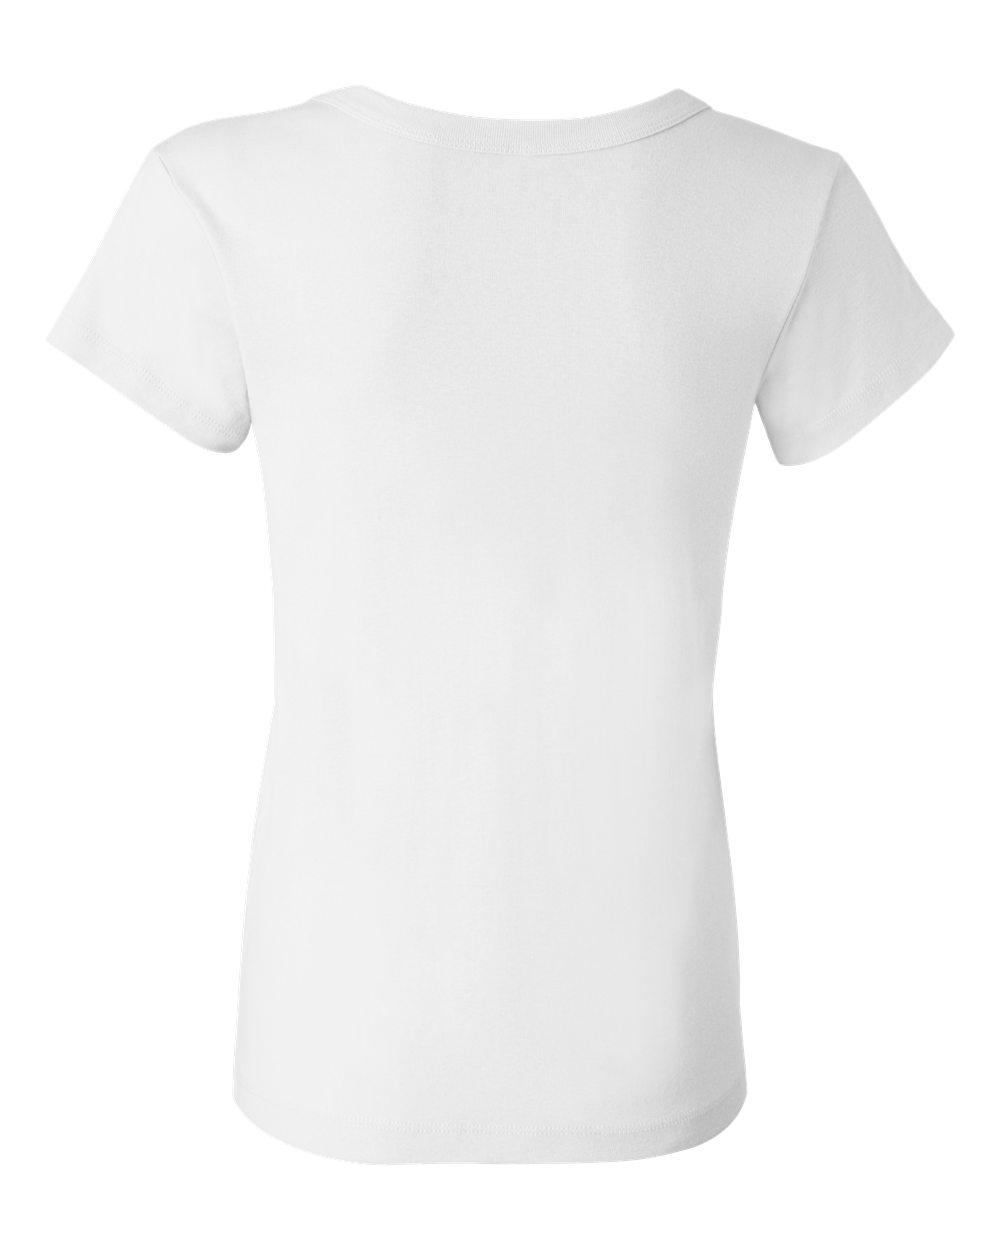 Bella-Canvas-Women-039-s-Stretch-Rib-Short-Sleeve-Scoop-Neck-T-Shirt-B1003-S-2XL thumbnail 5